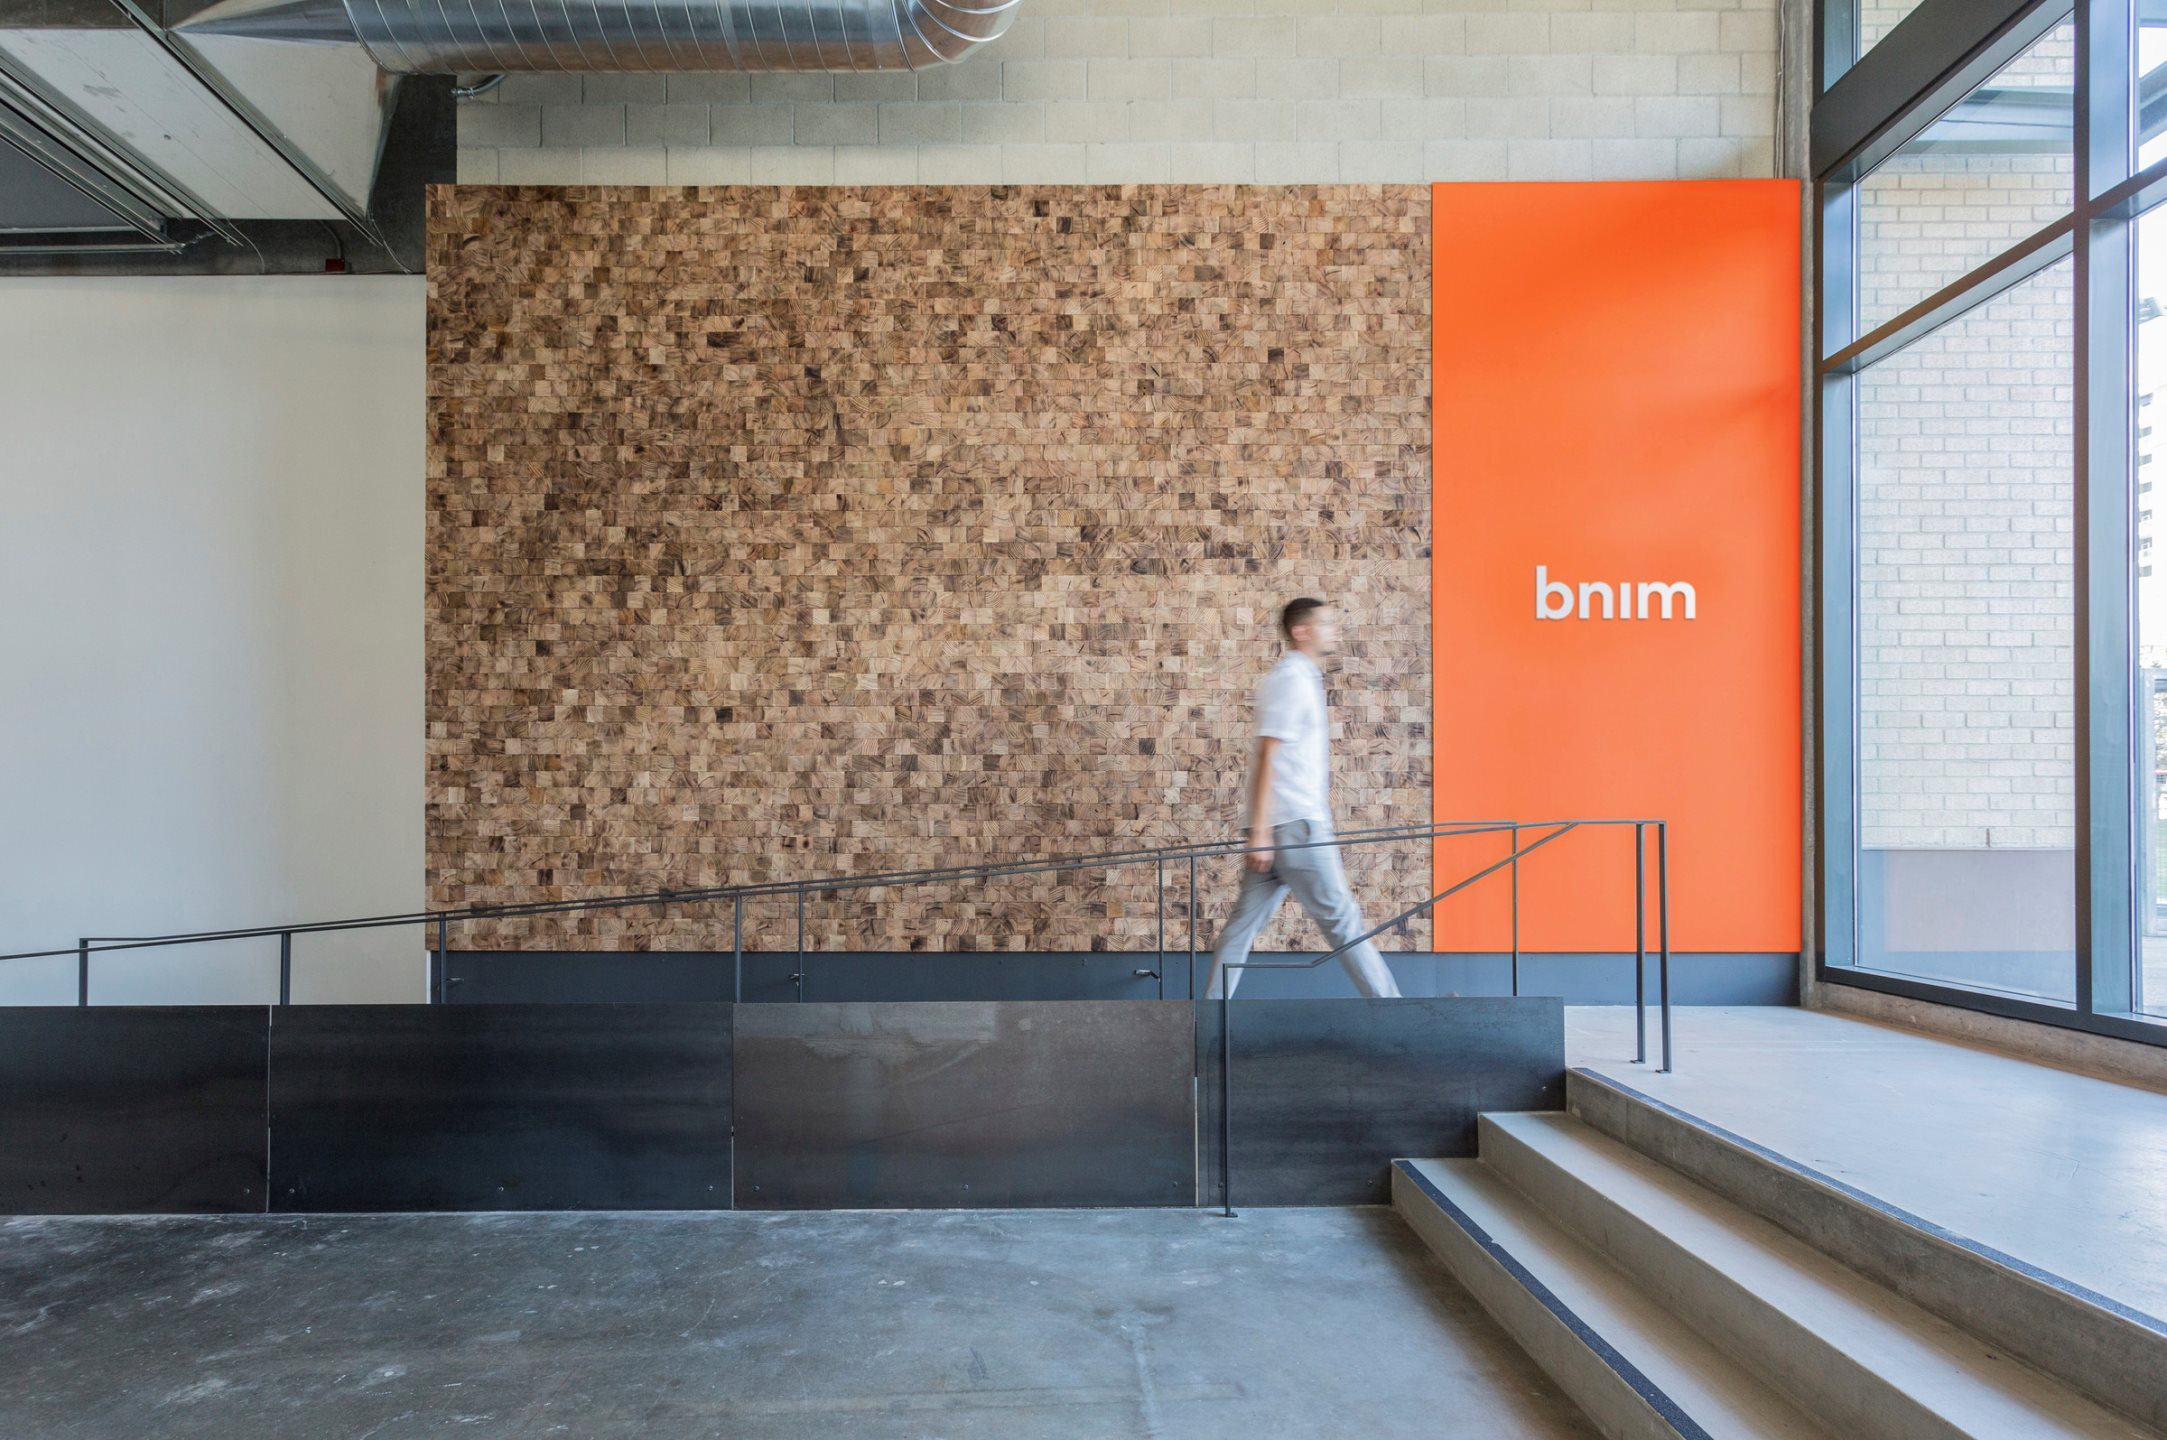 Miraculous Bnim San Diego Office Bnim Interior Design Ideas Tzicisoteloinfo